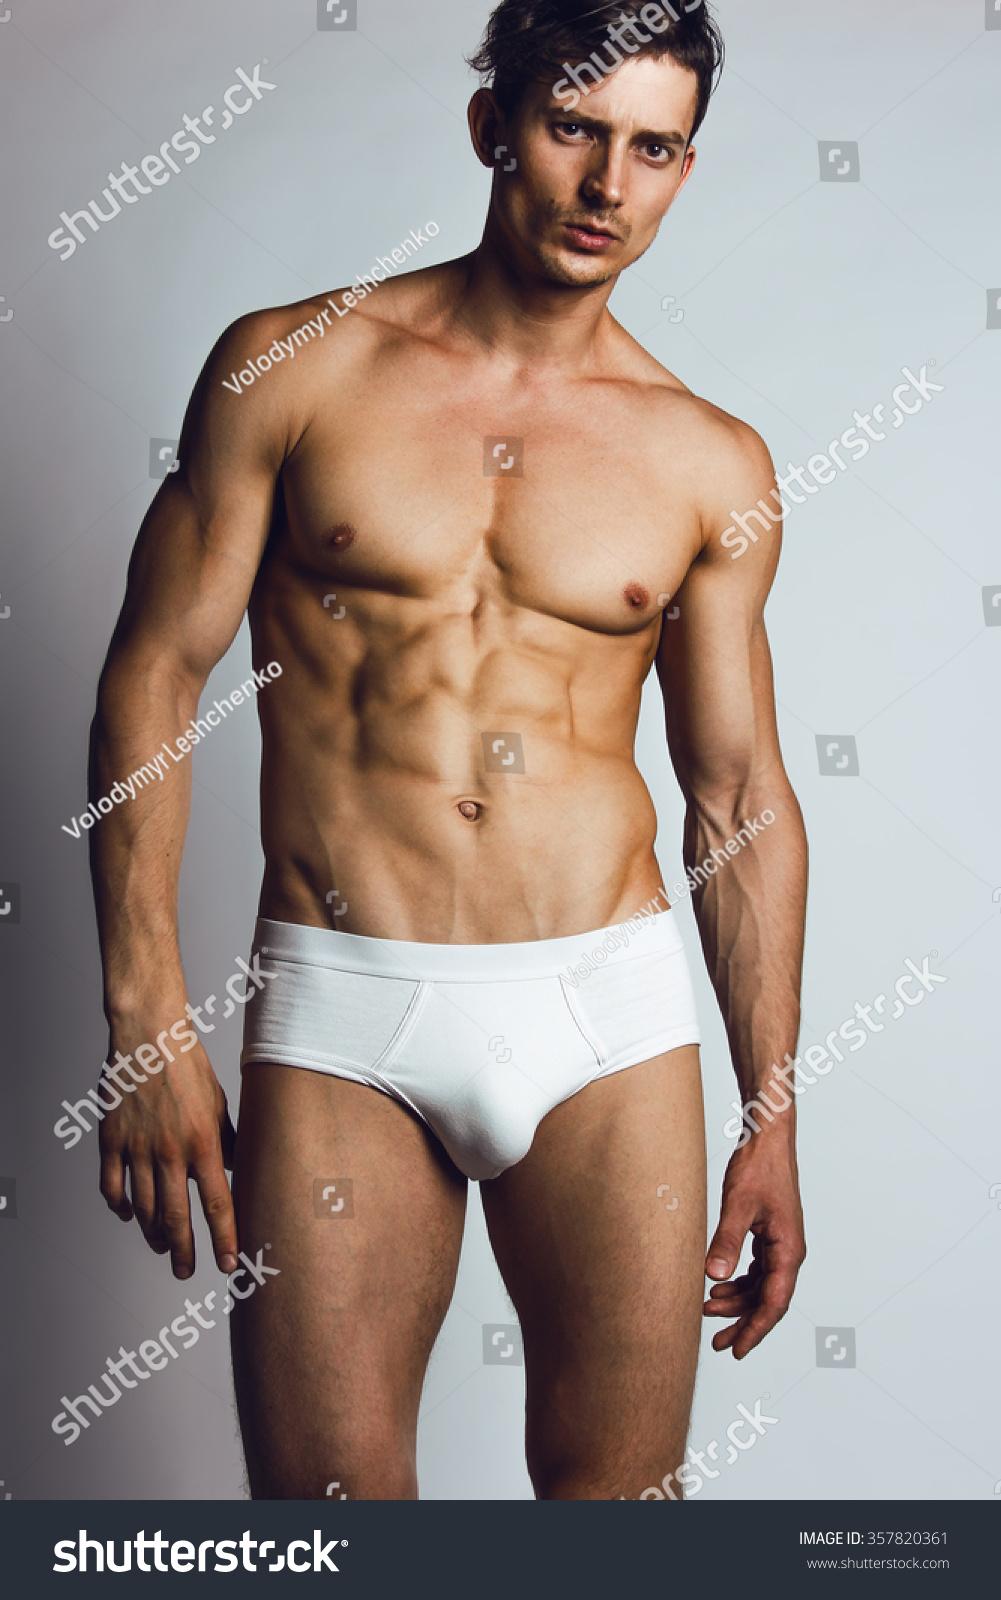 Male Swimwear Underwear Concept Handsome Muscular Stock ...